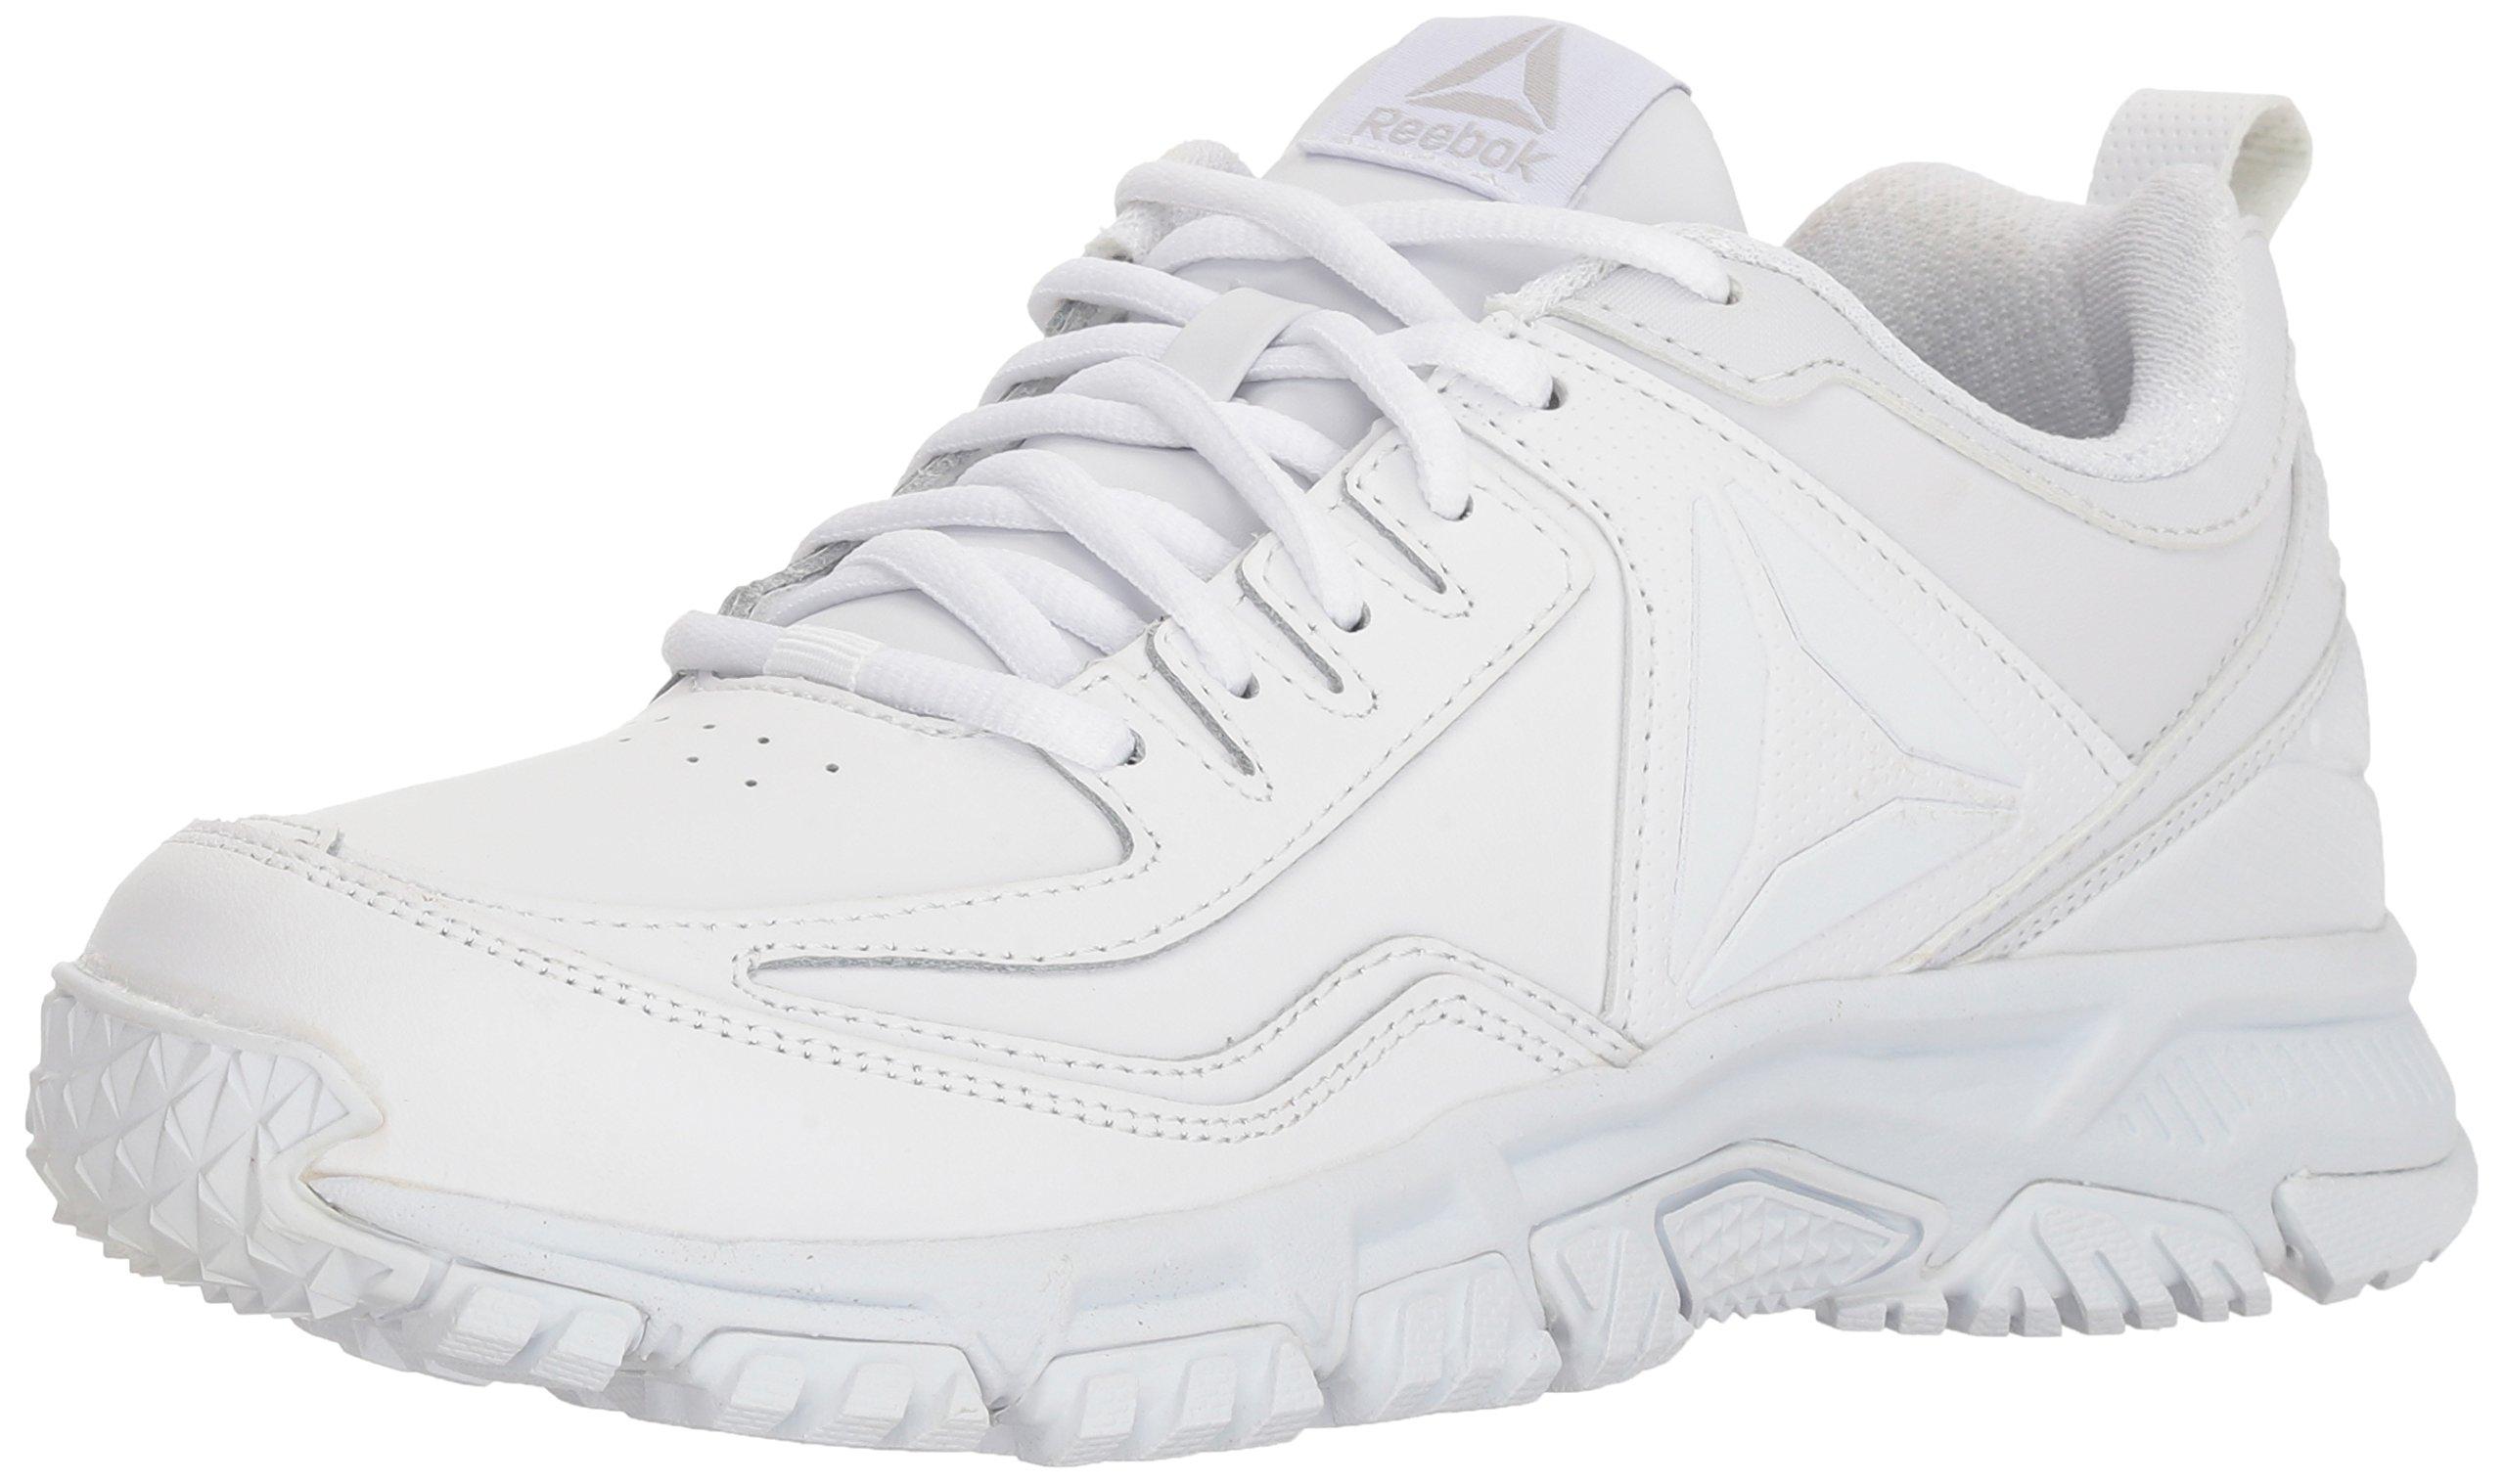 bda50c6294ed Reebok Men s Ridgerider Leather Sneaker   Fashion Sneakers ...